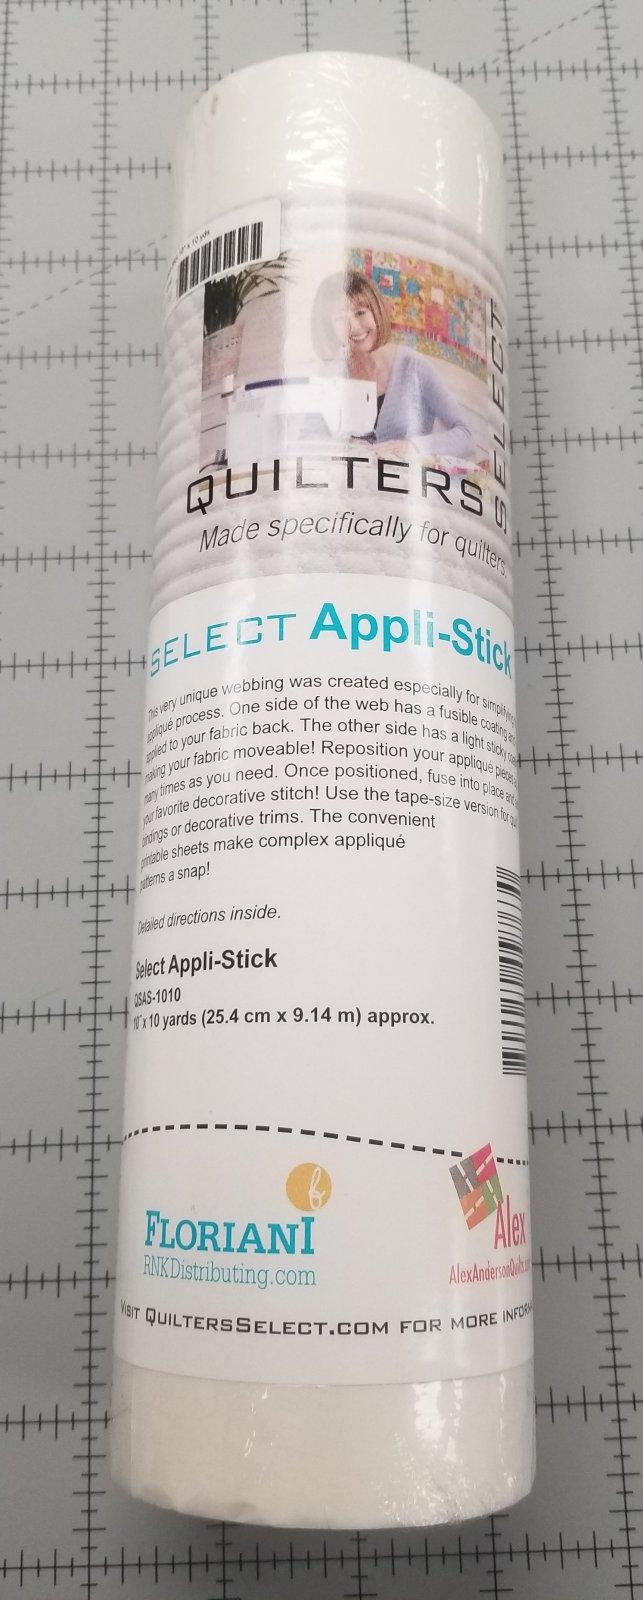 Select Appli-stick 10 x 10 yds